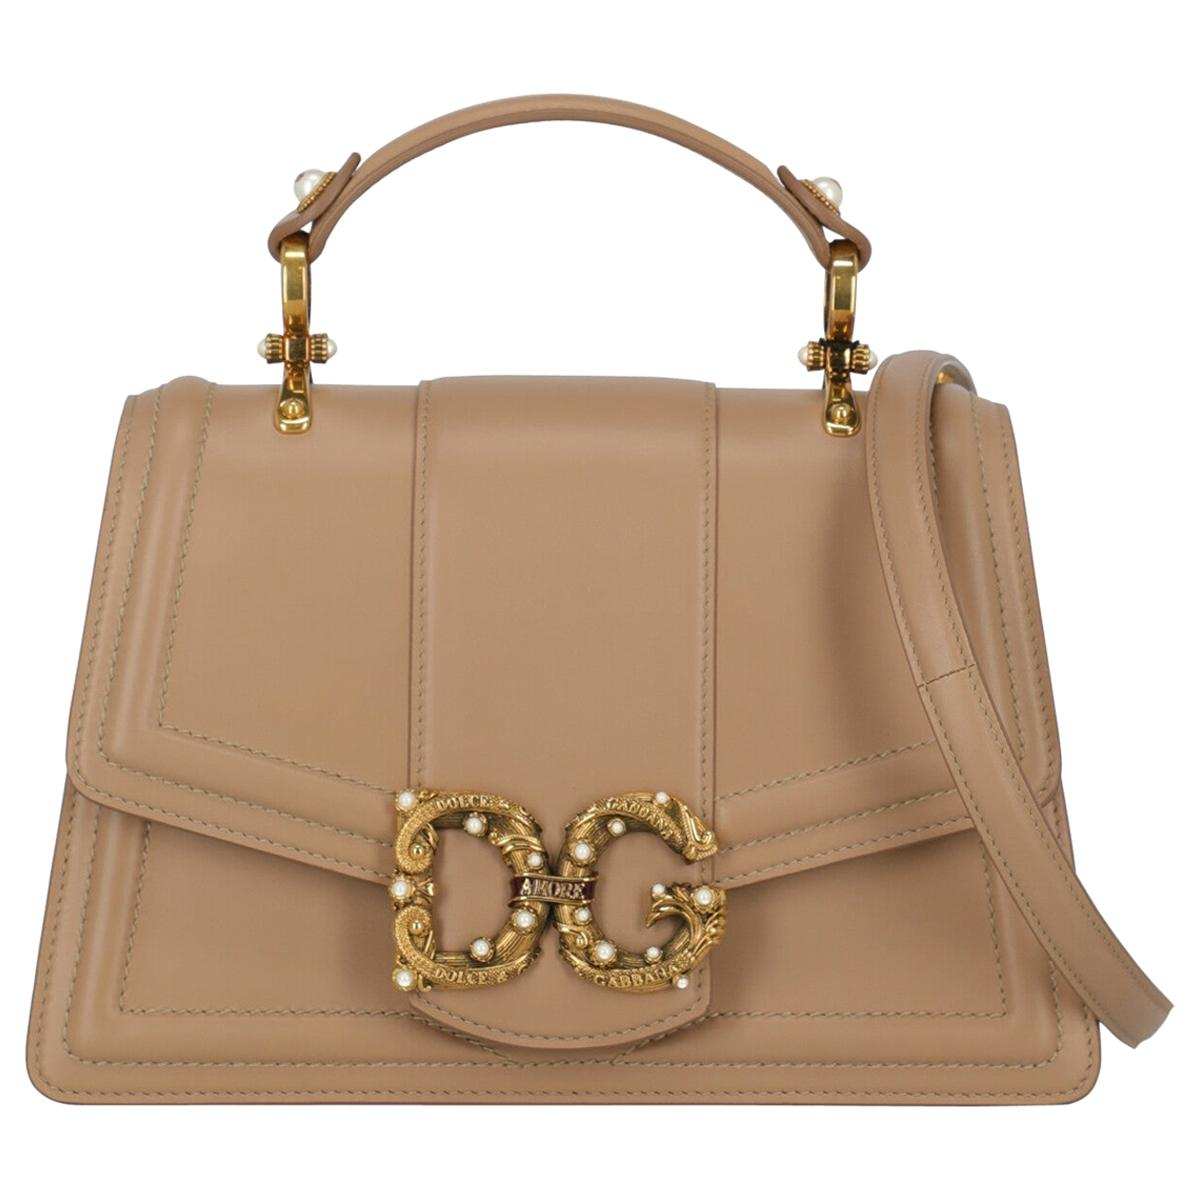 Dolce & Gabbana Woman Handbag Beige Leather